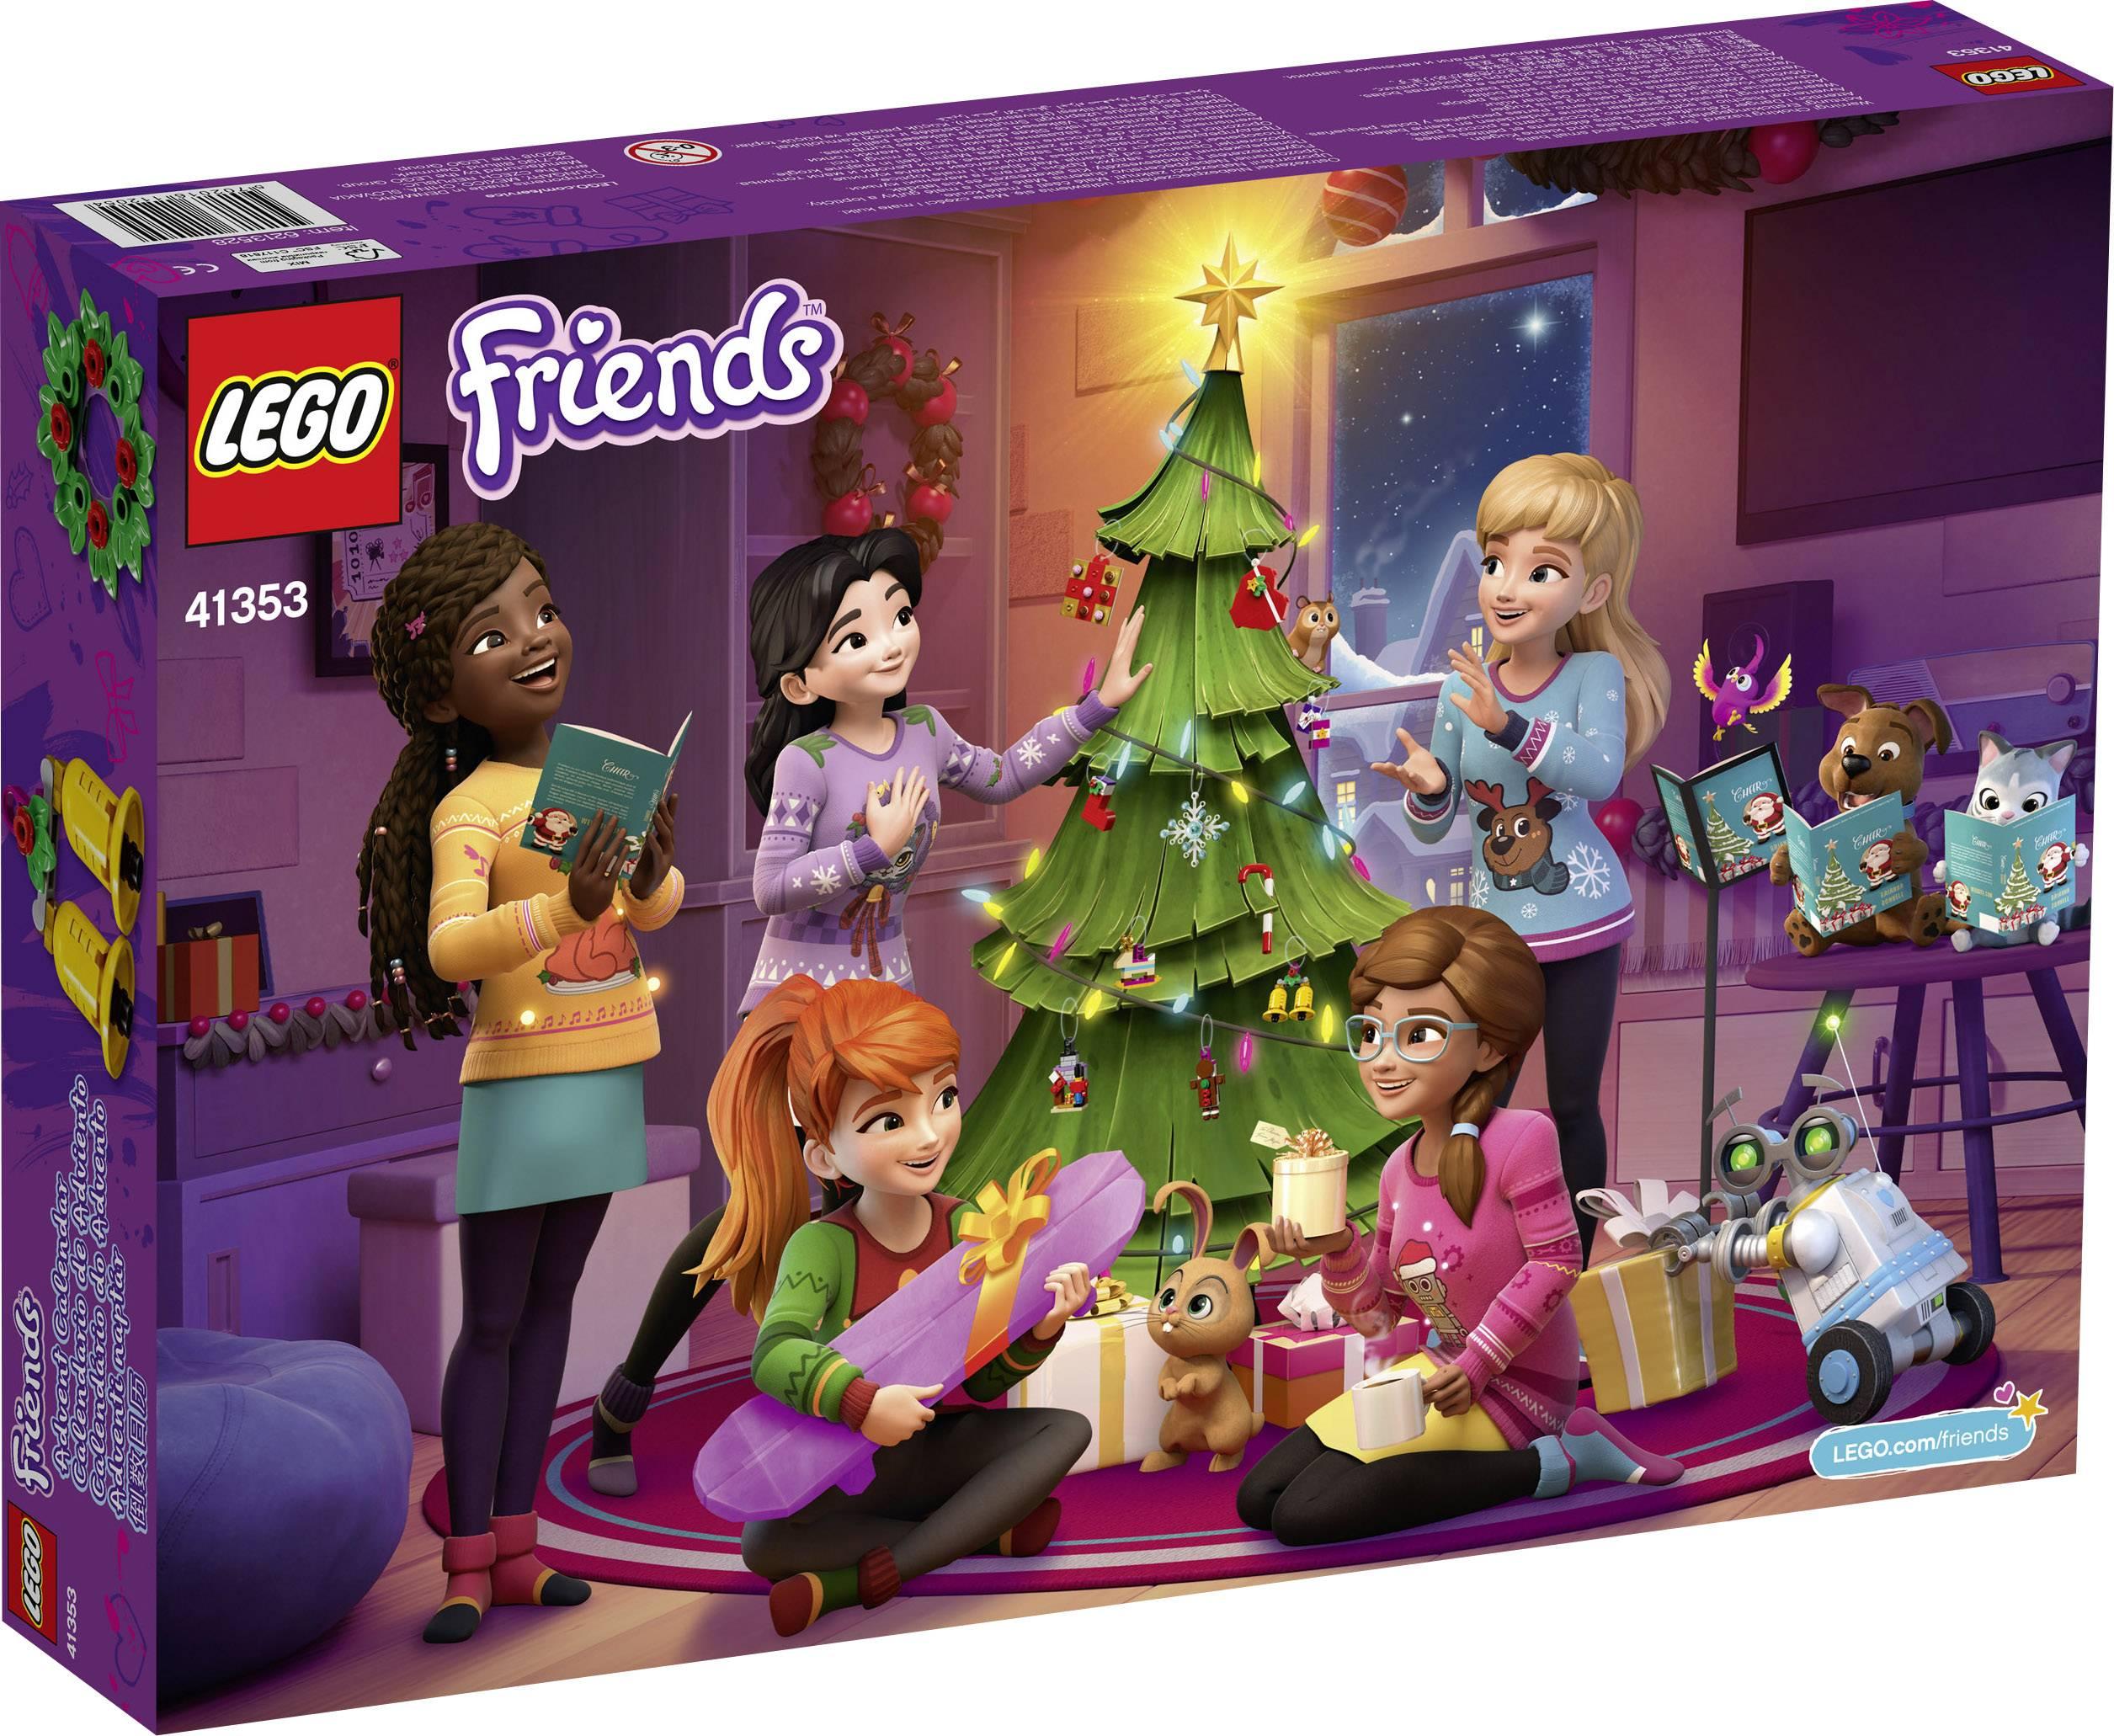 Lego Ans Calendrier Friends 6 De 12 L'avent FJ1TK3lc